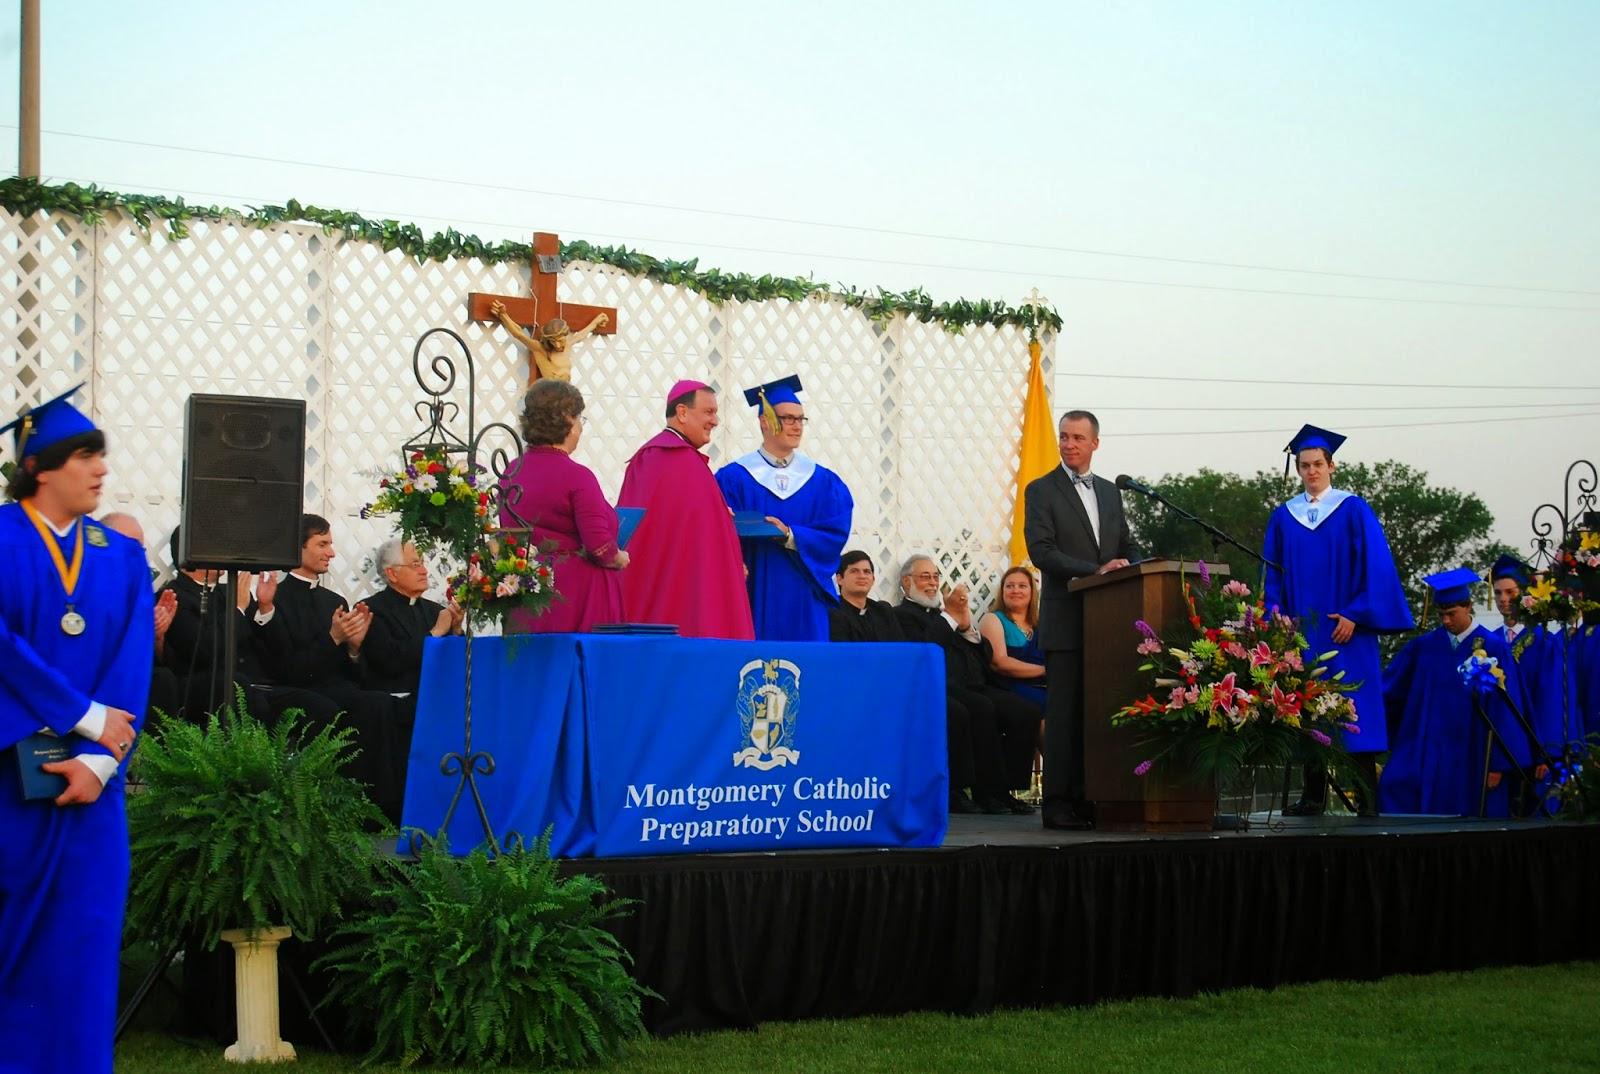 Montgomery Catholic Preparatory School Celebrates the 139th Graduating Class: The Class of 2014 2